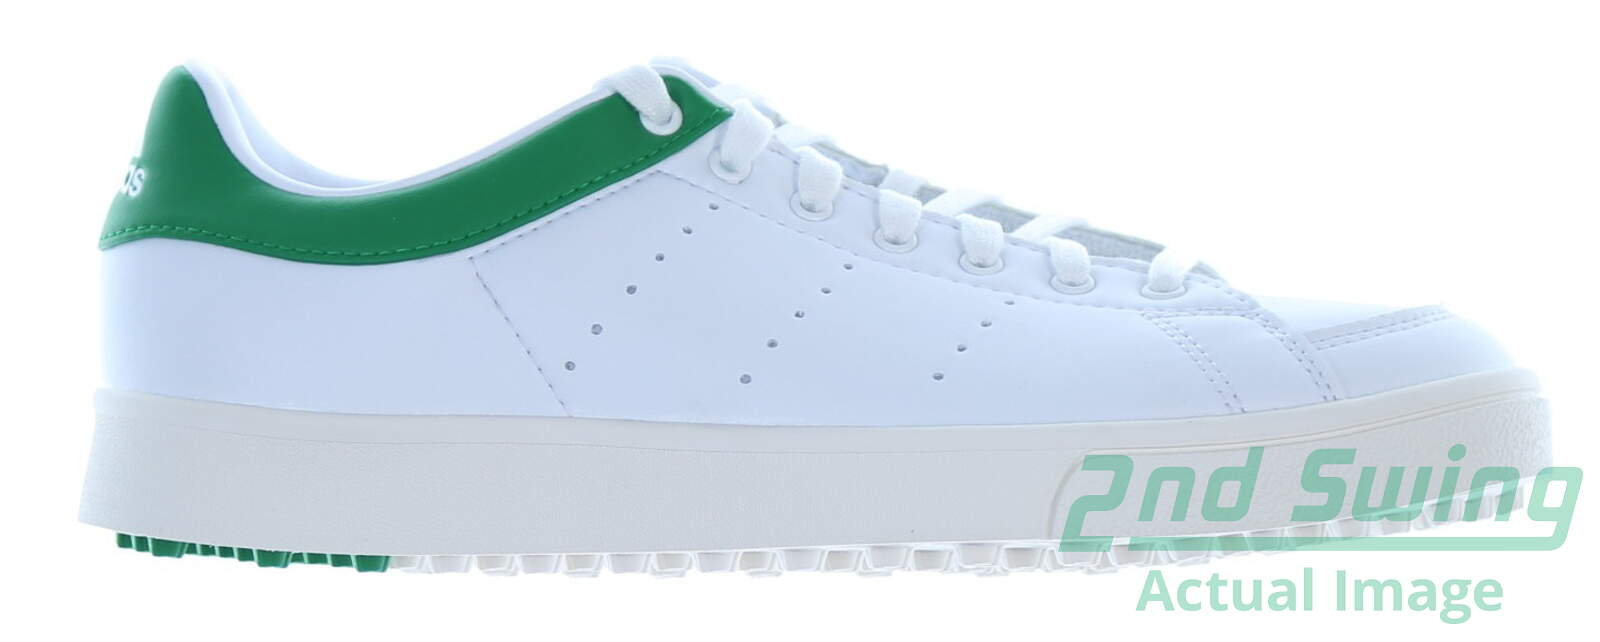 f154863eda8a New Junior Golf Shoe Adidas Jr Adicross Classic Medium 5 White Green MSRP   60 - Golf Footwear